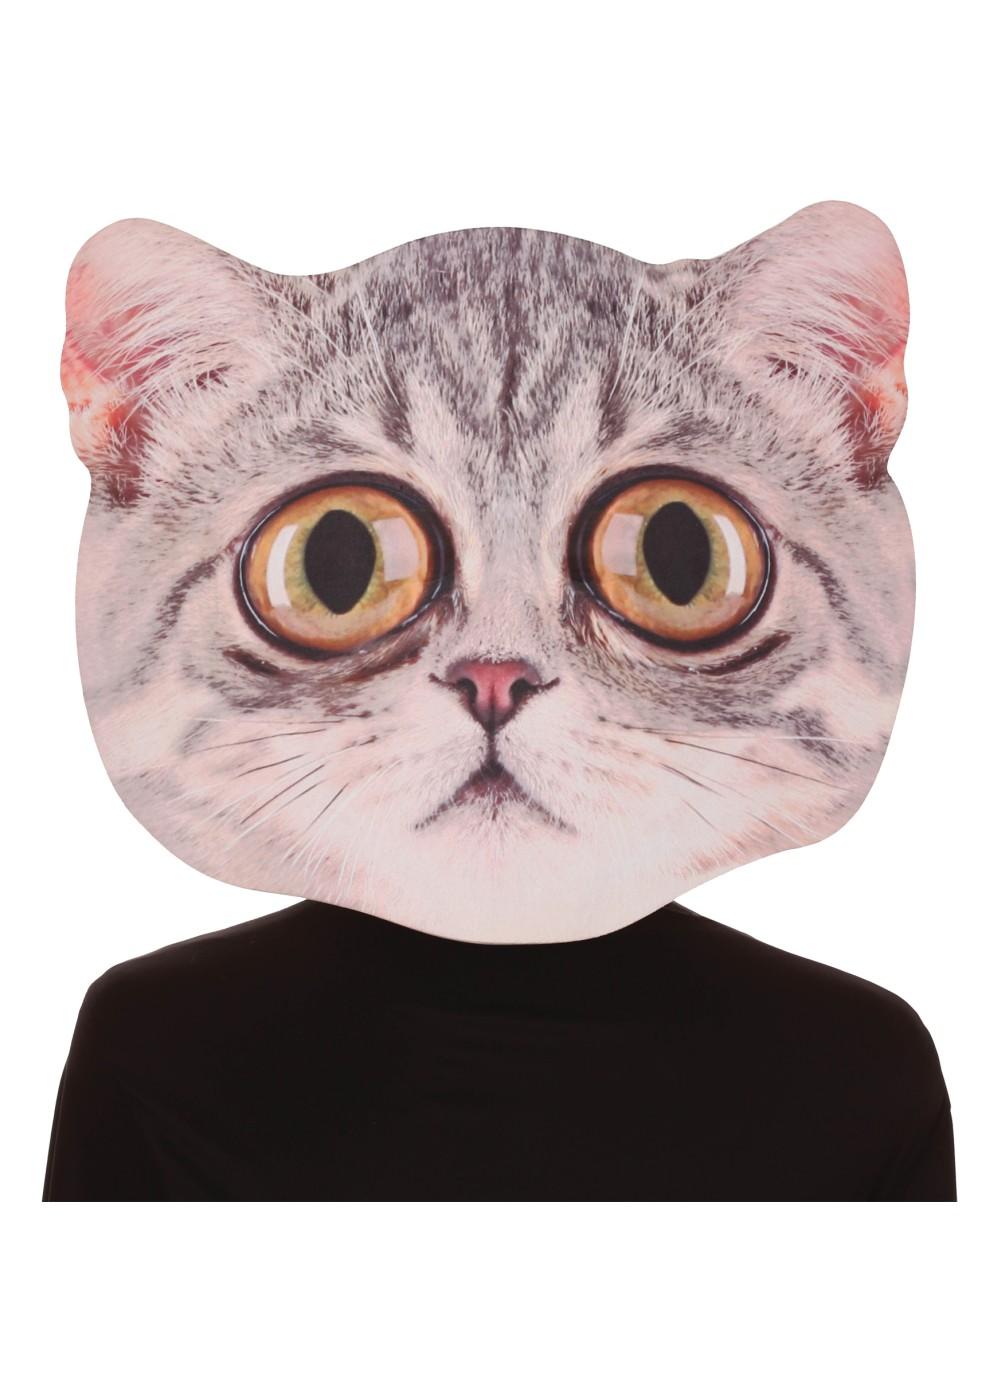 Giant Eyes Cat Makeup